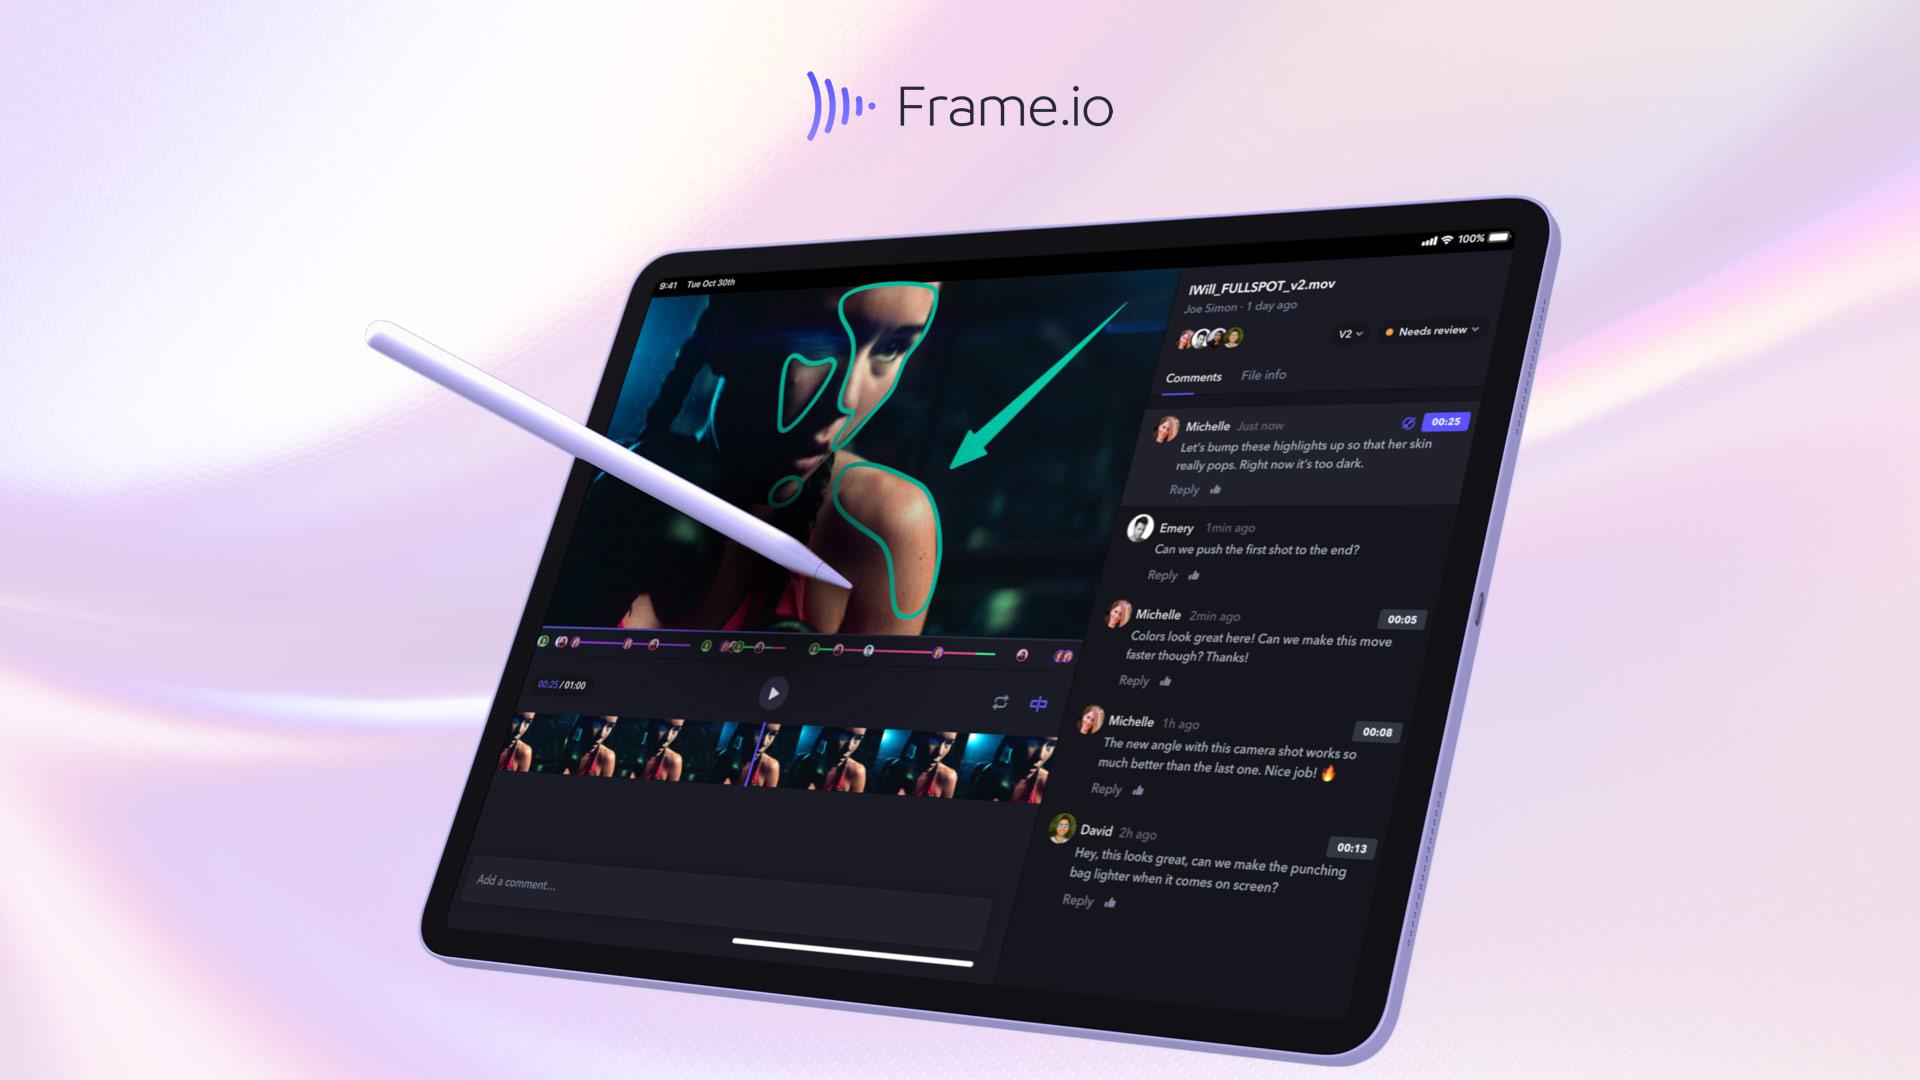 Anuncian versión de Frame.io para iPad